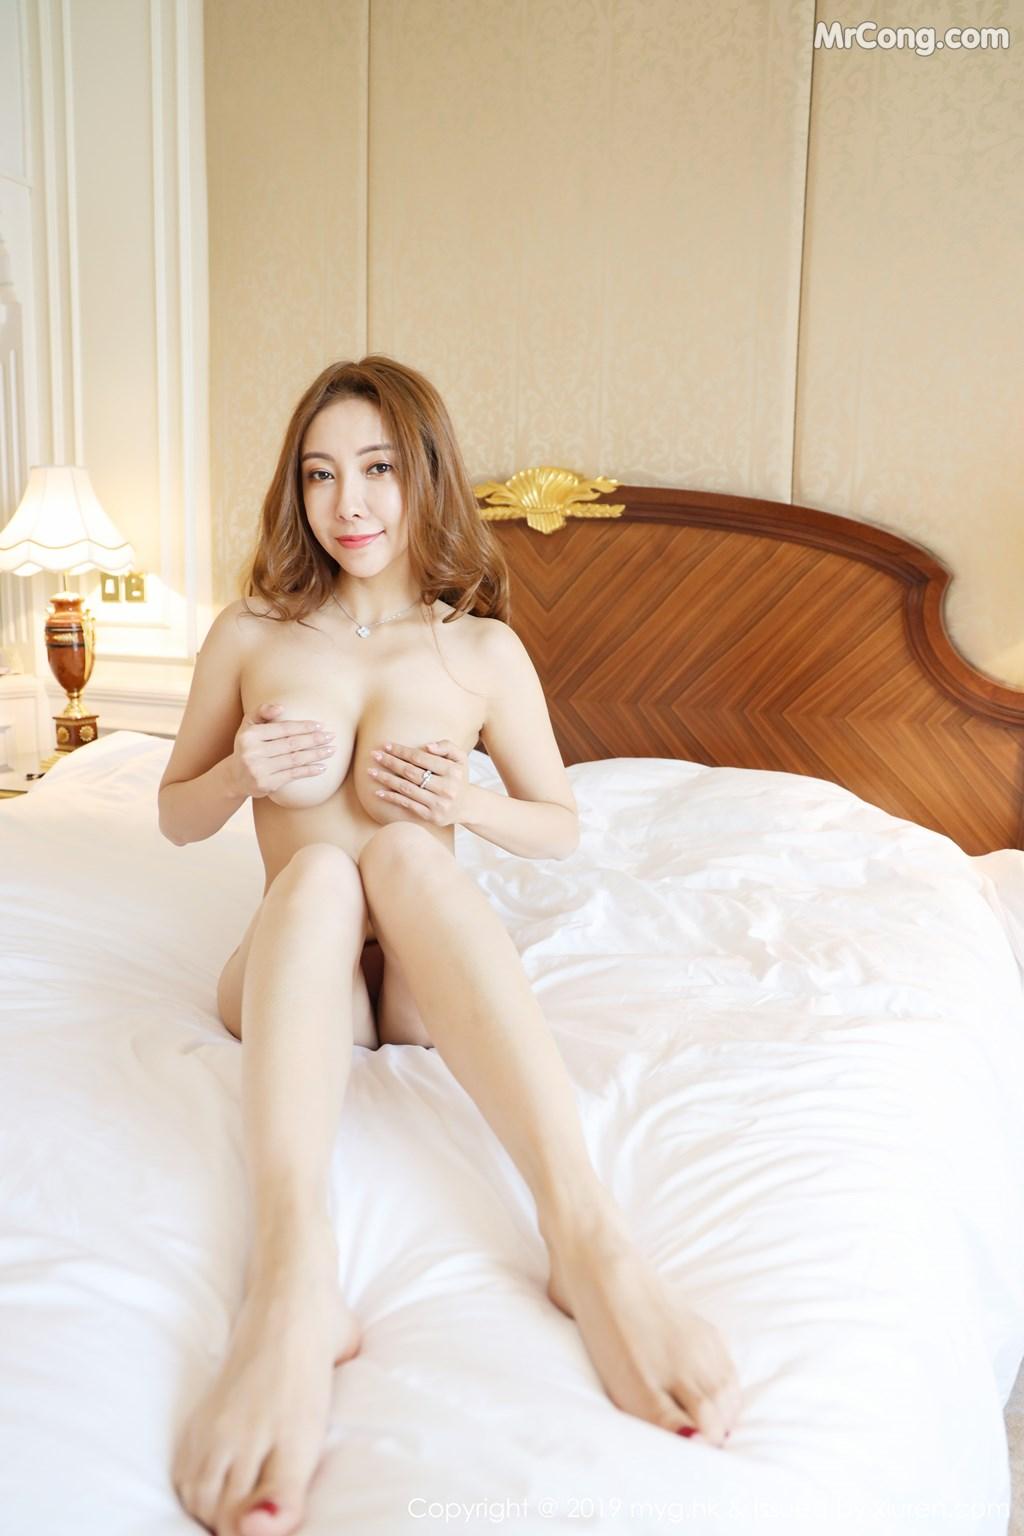 Image MyGirl-Vol.352-Victoria-Guo-Er-MrCong.com-025 in post MyGirl Vol.352: Victoria (果儿) (40 ảnh)